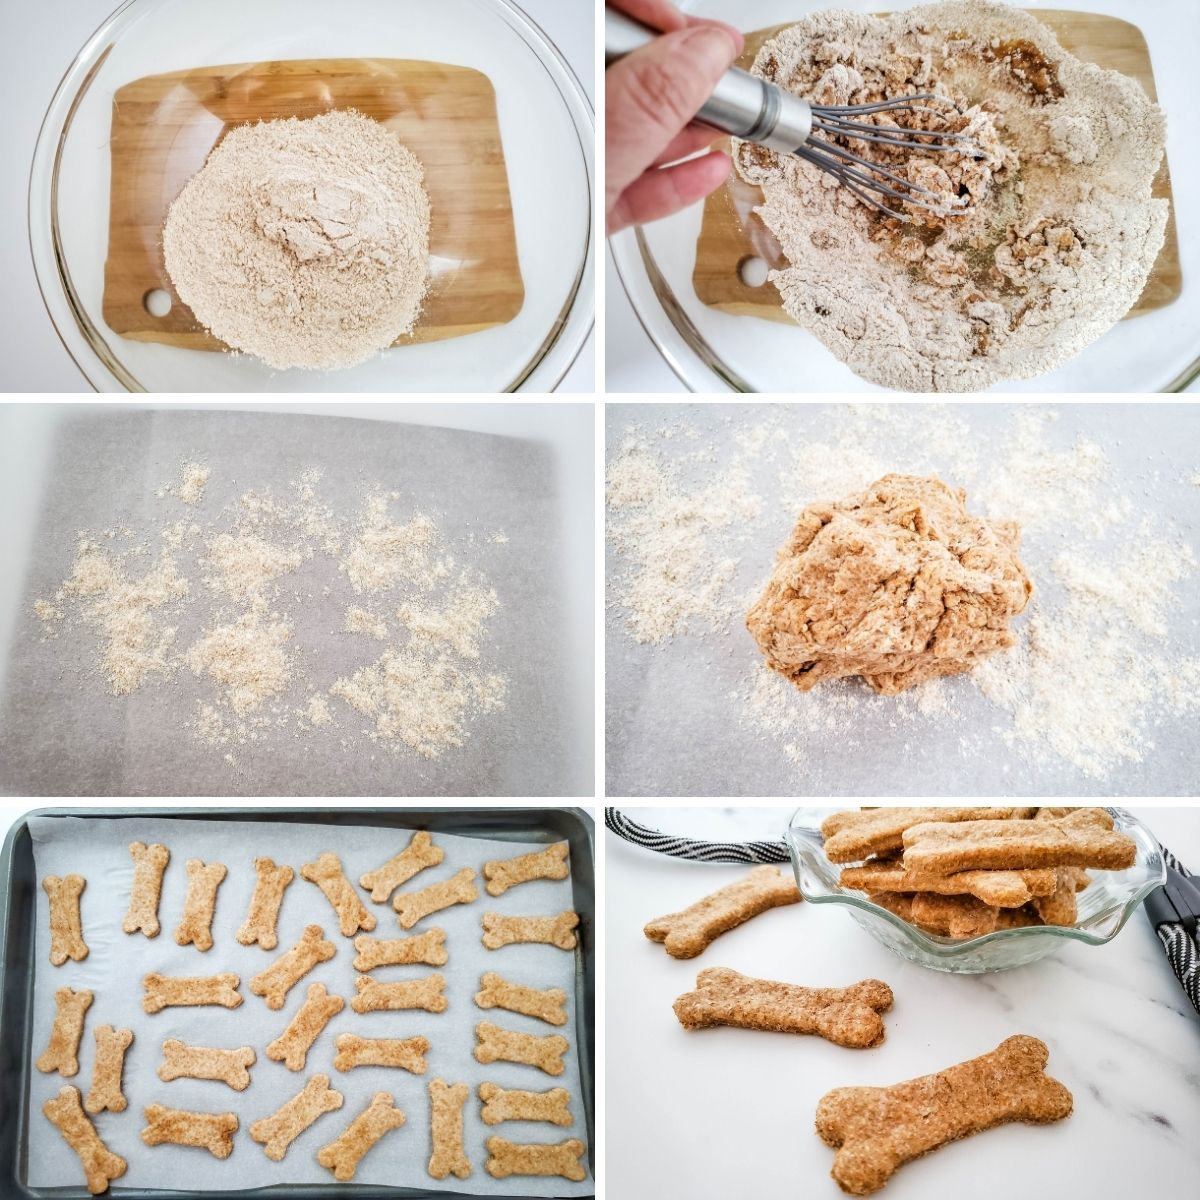 Directions chicken dog biscuits